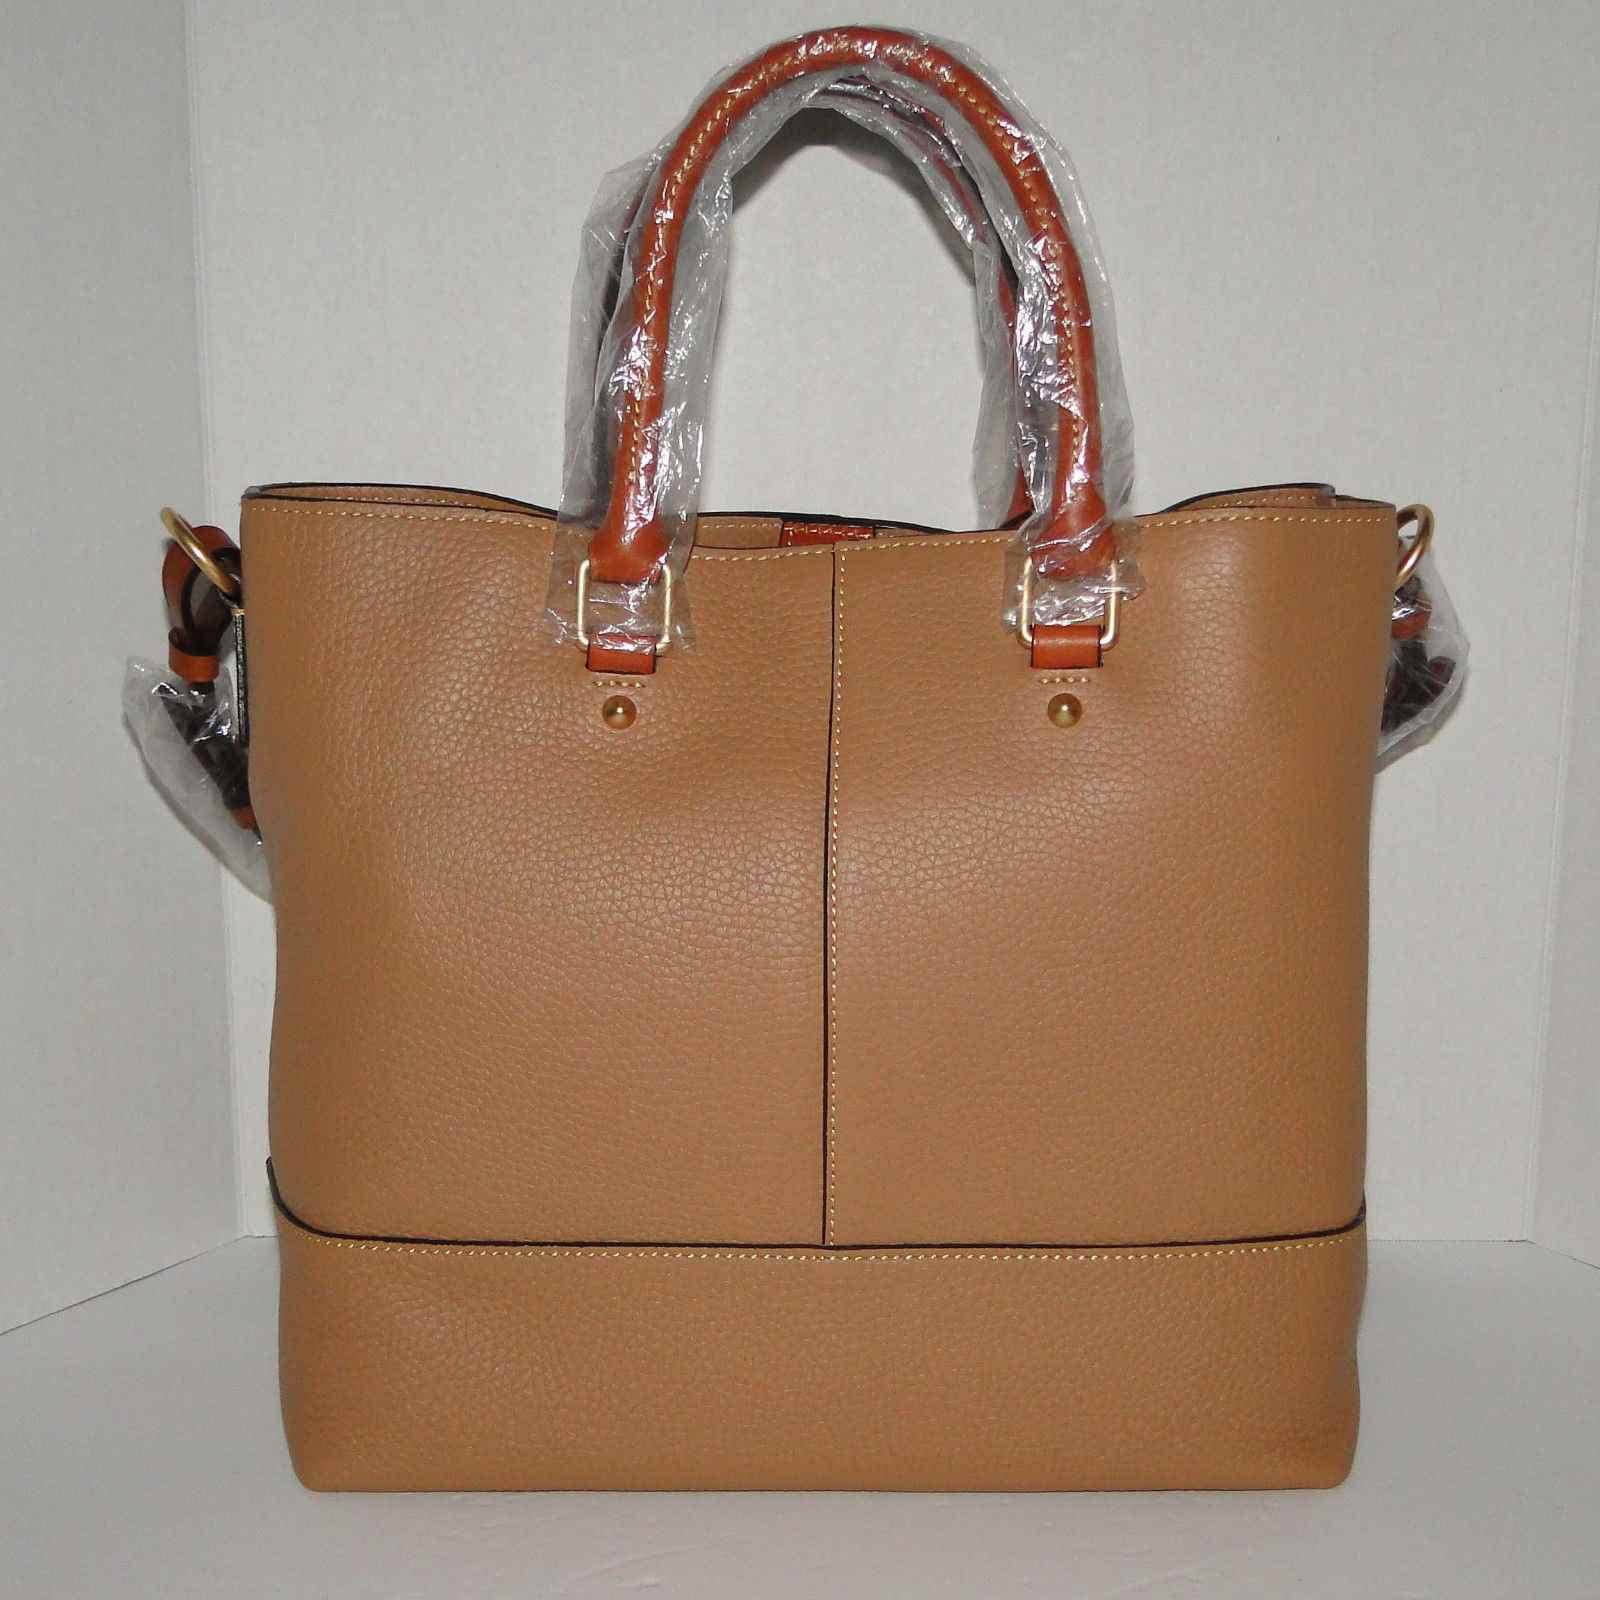 Dooney & Bourke Dillen Chelsea Leather Shopper Sand Color